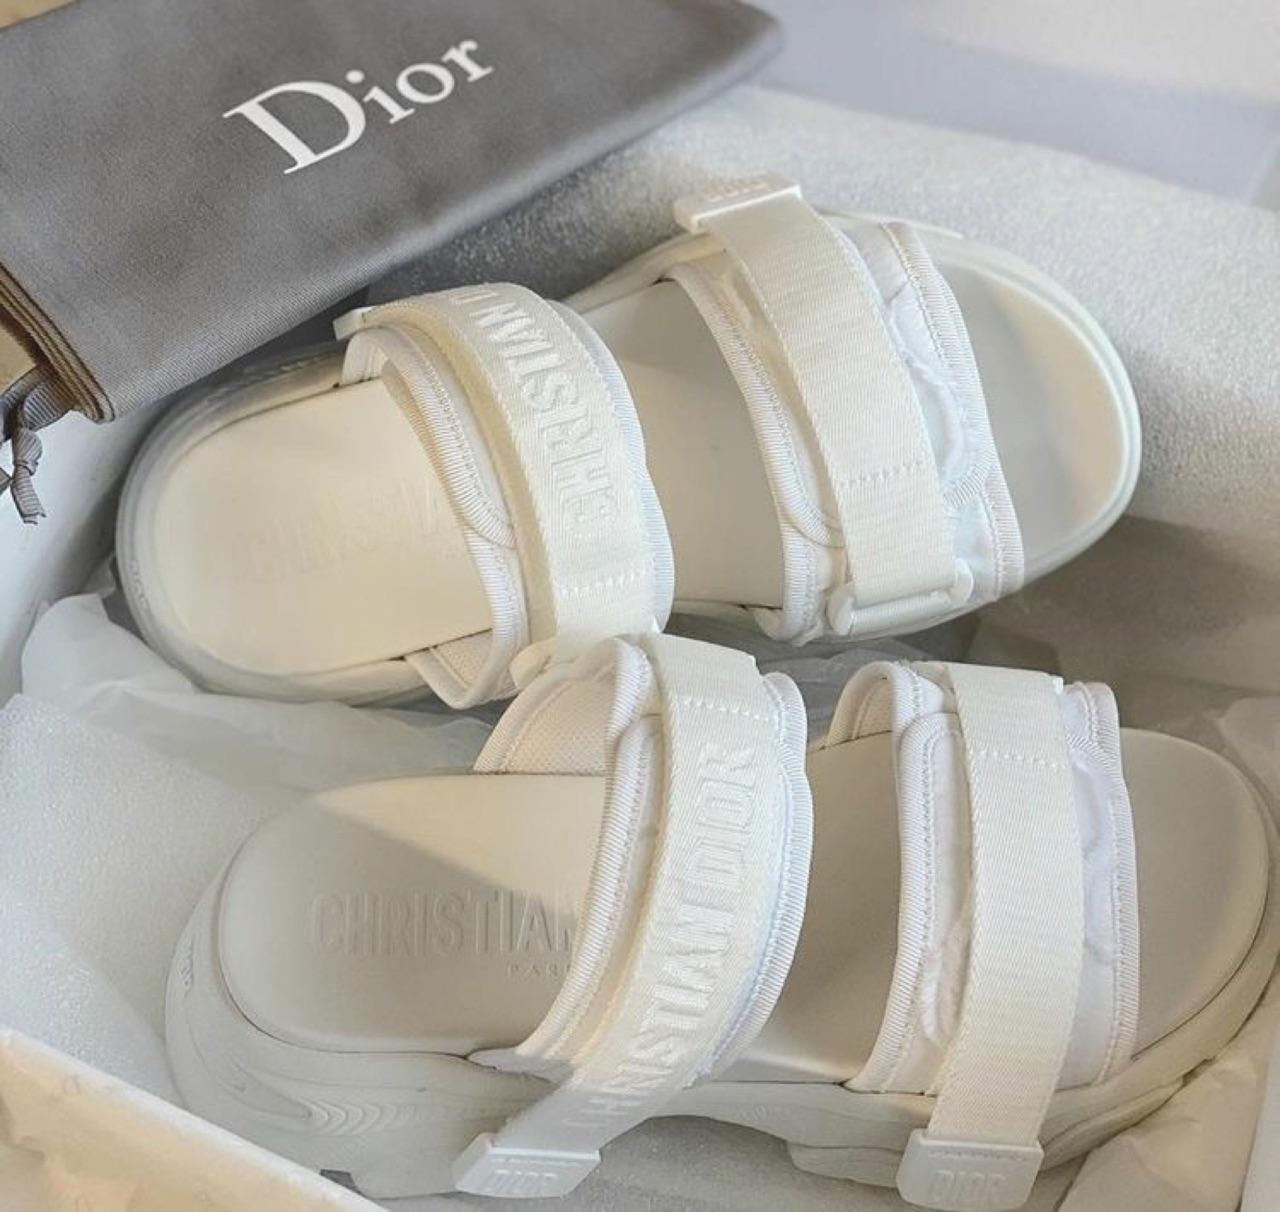 Christian Dior image